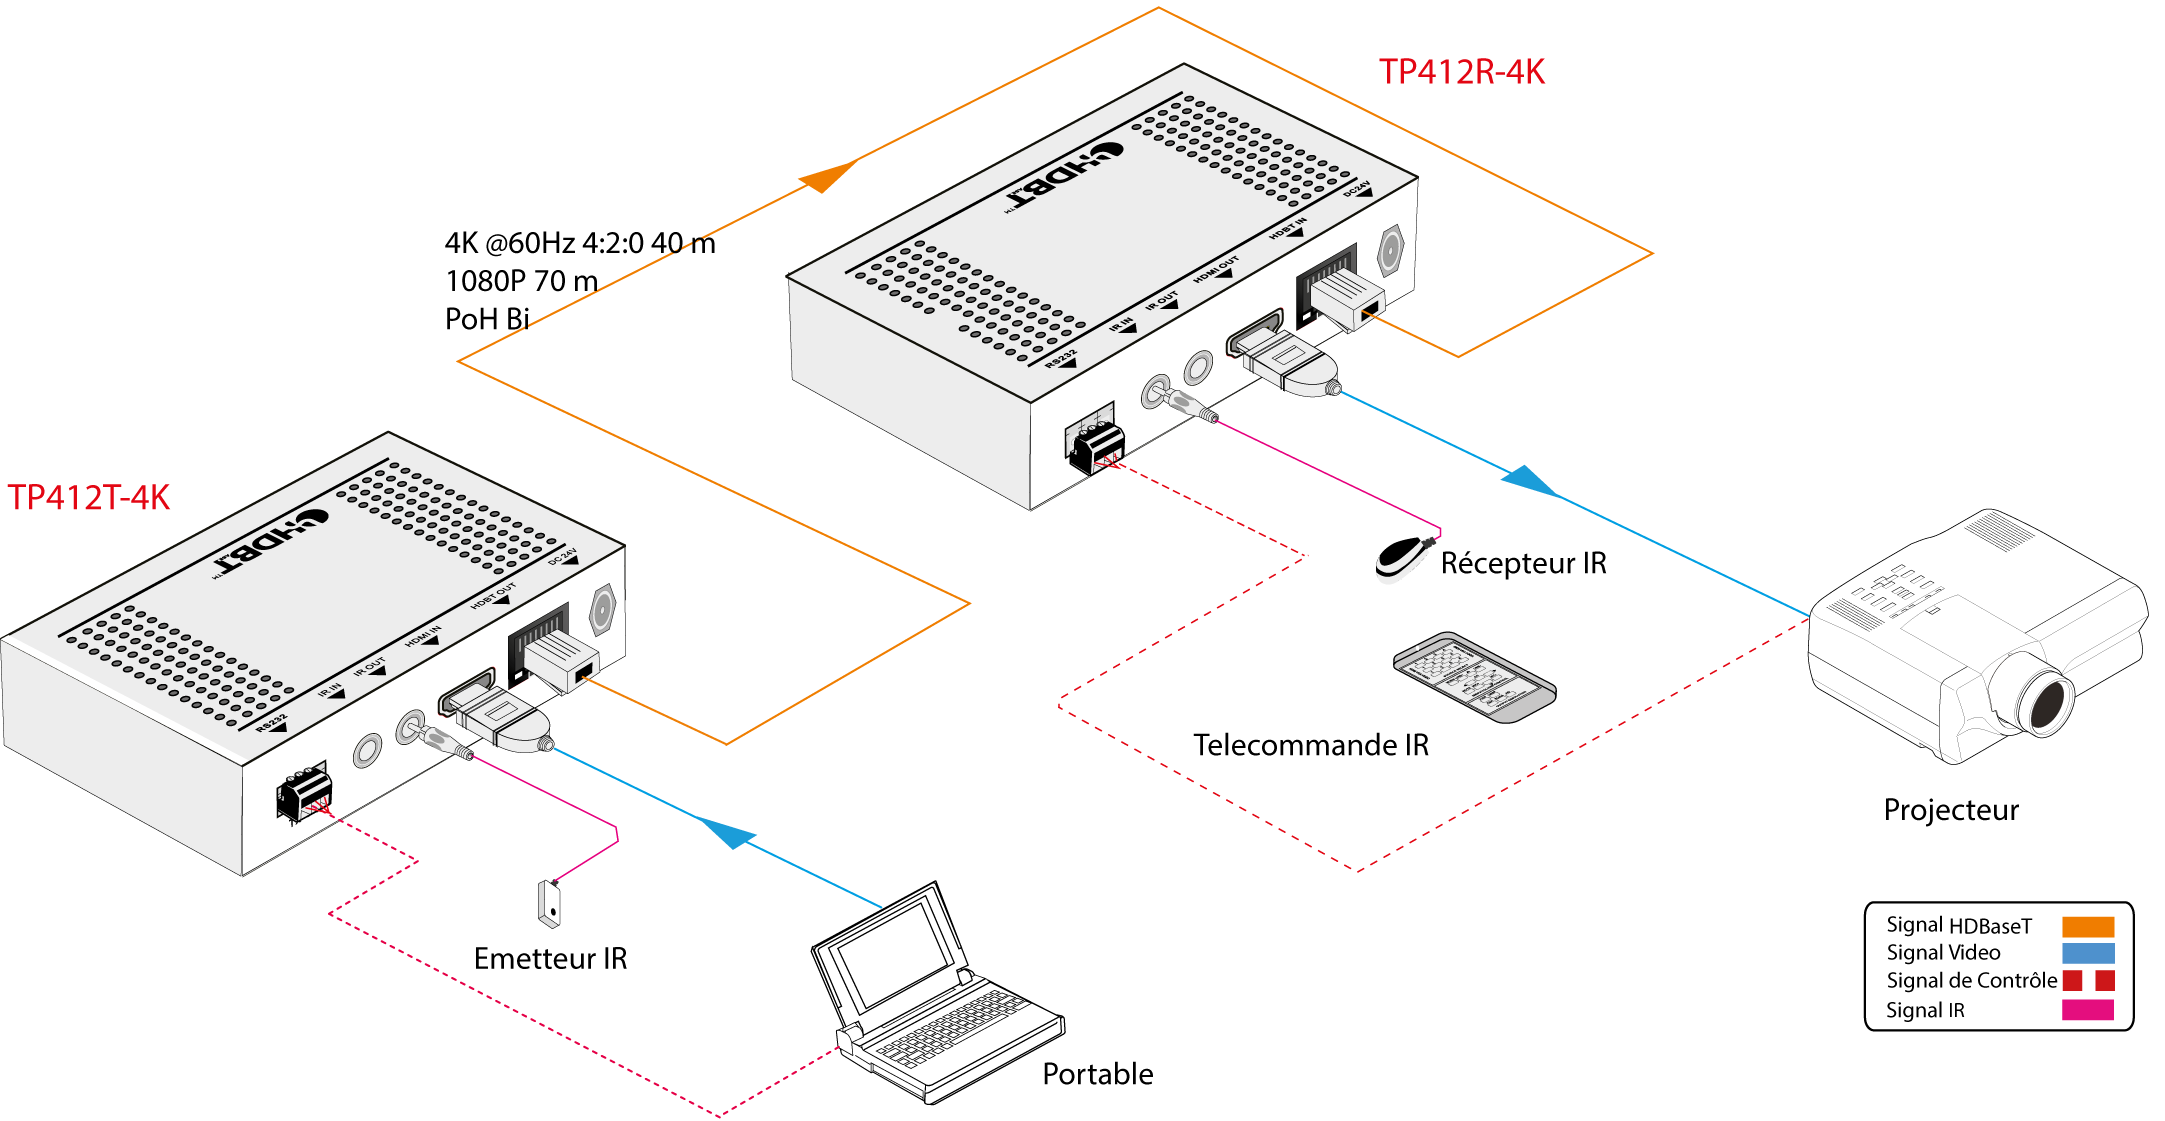 TP412R-4K | Extendeur Recepteur HDMI HDBT 4K 70m POC ultra fin